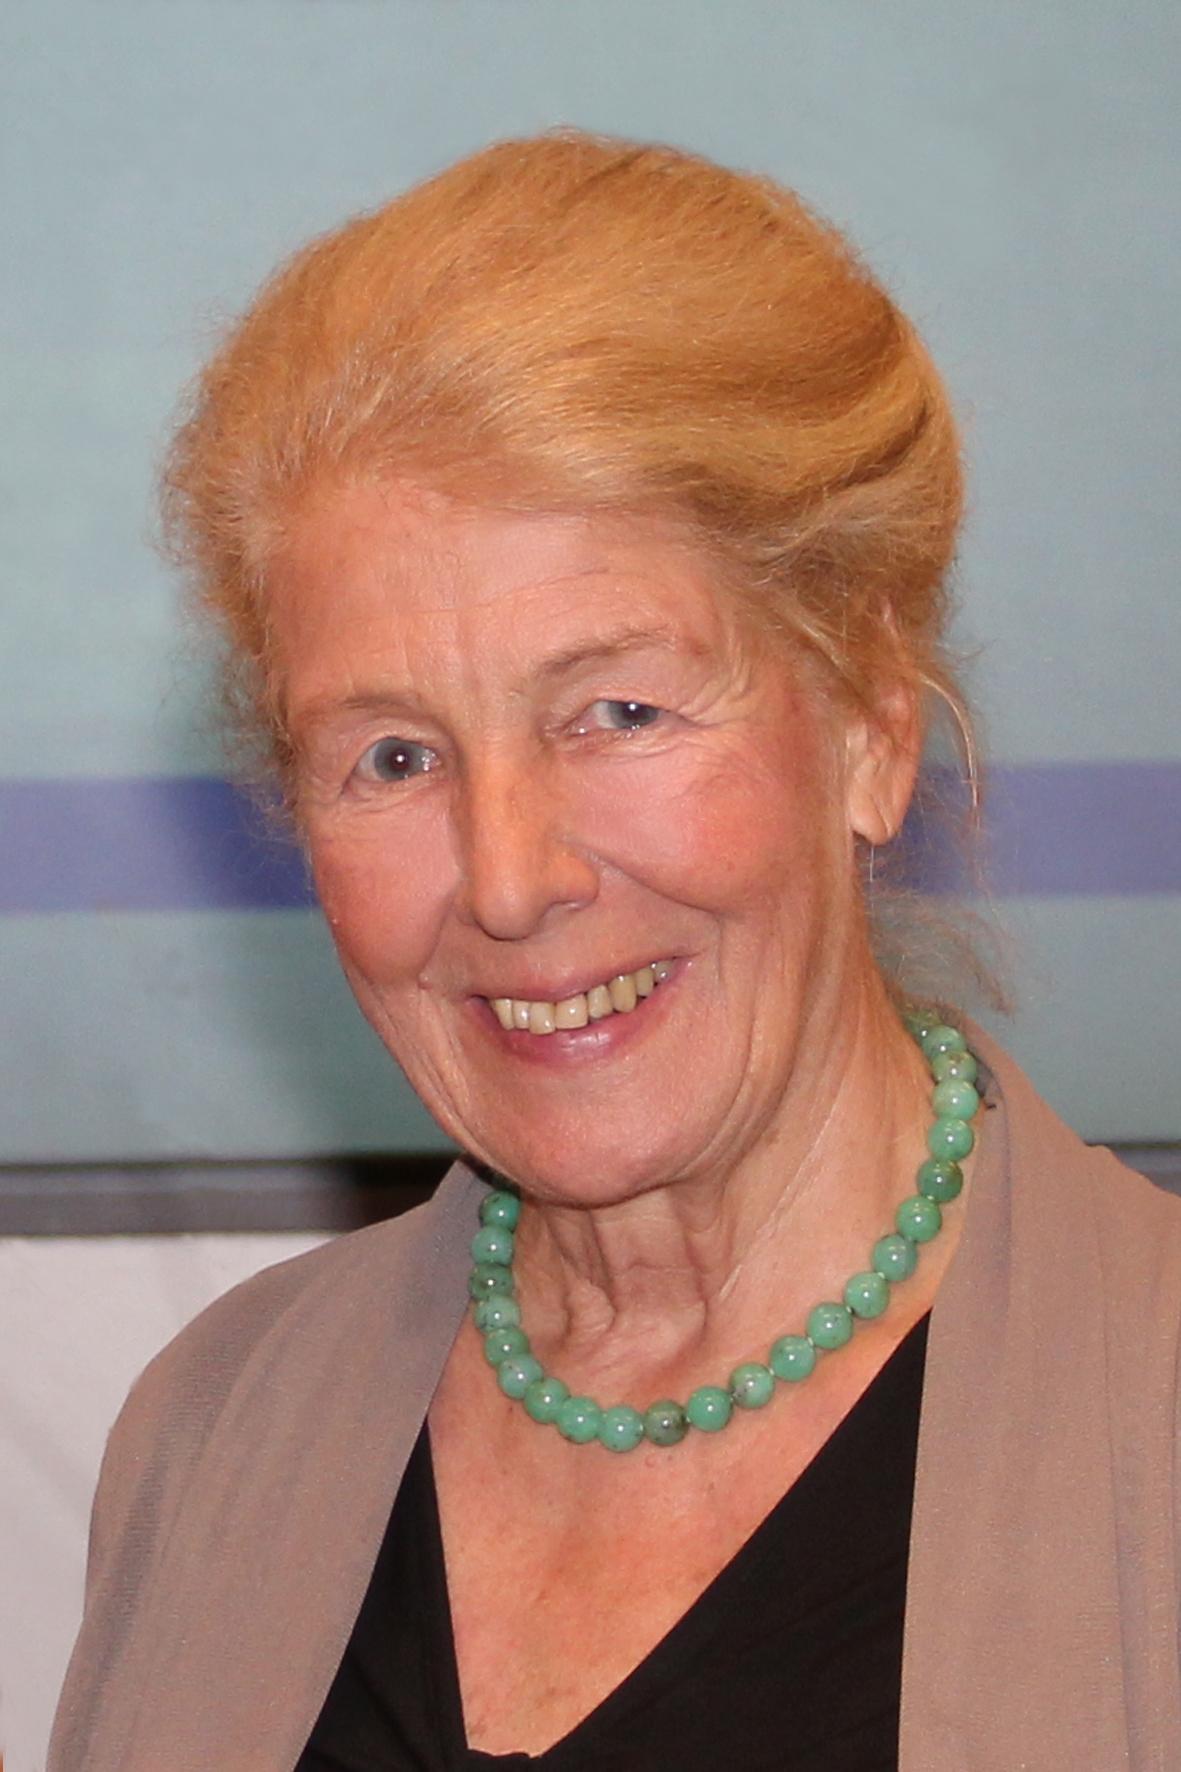 BILD zu OTS - Univ. Prof. Dr. Elisabeth Seidl